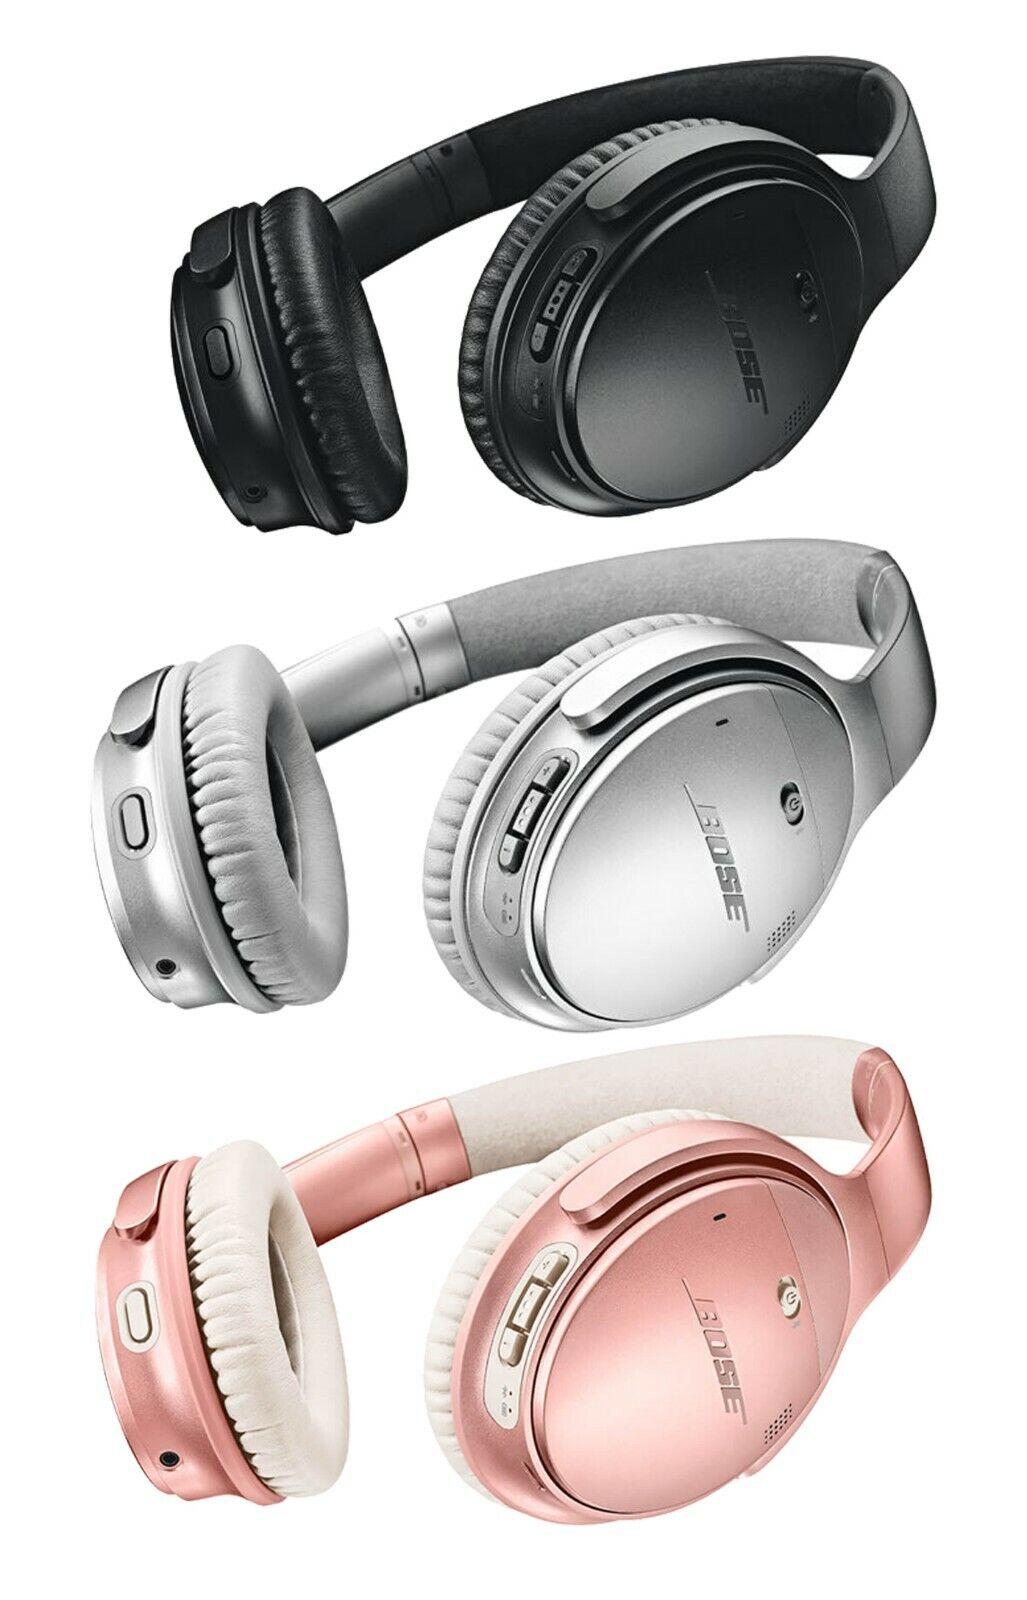 Bose QuietComfort 35 II Bluetooth Wireless Noise-Canceling H